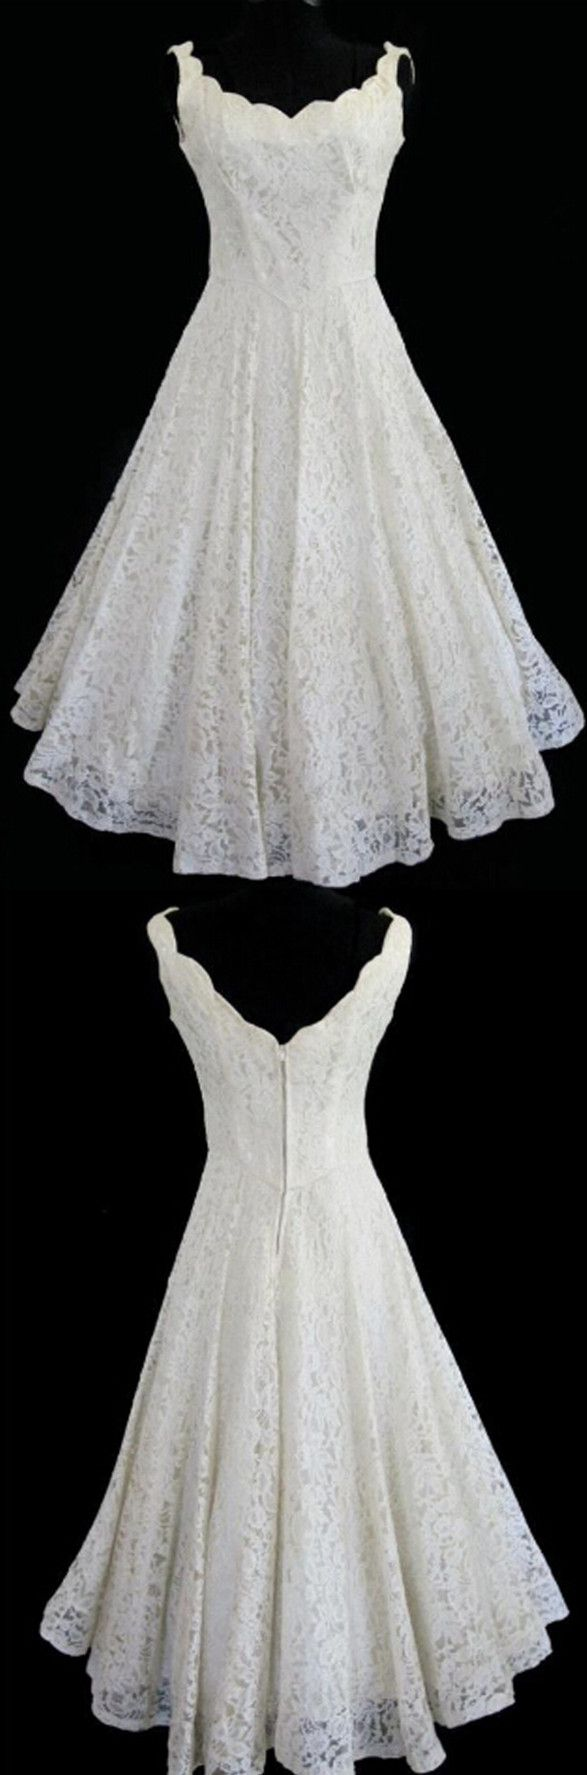 Vintage Lace Wedding Gowns Sydney : Best ideas about short lace wedding dress on